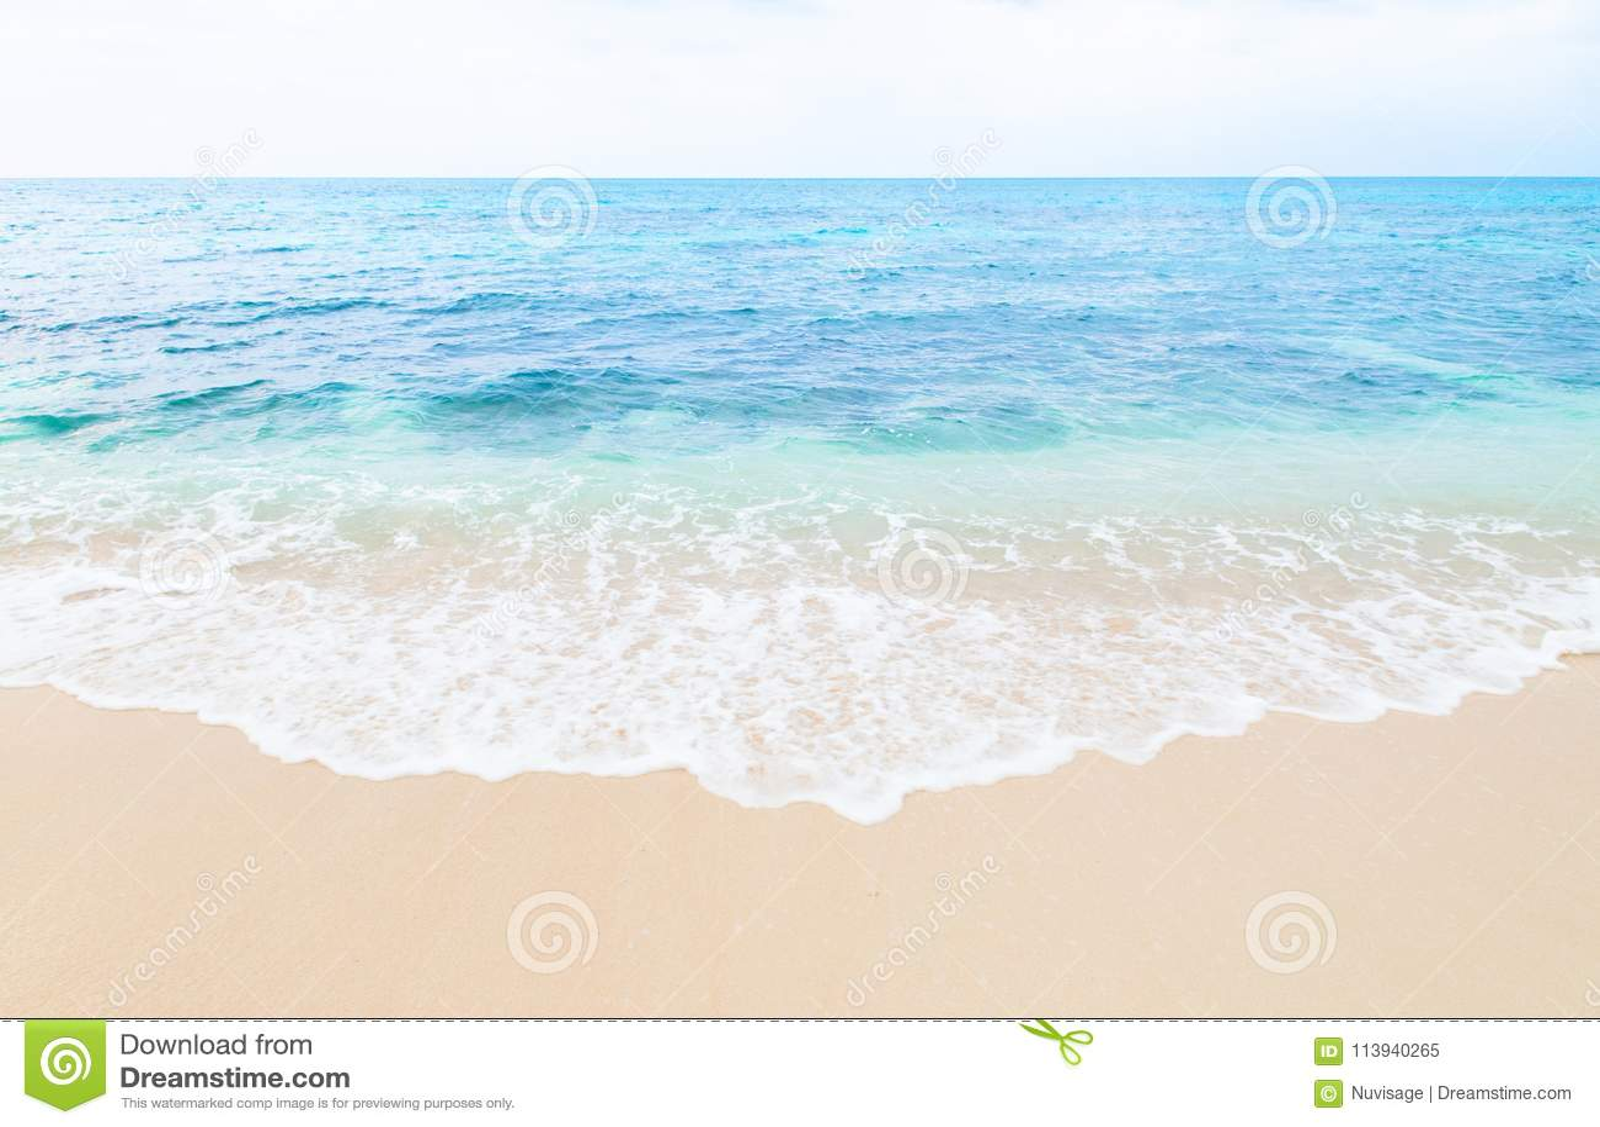 Mooi het zandstrand van de golfaanraking van Miyako-eiland, Okinawa, Japan